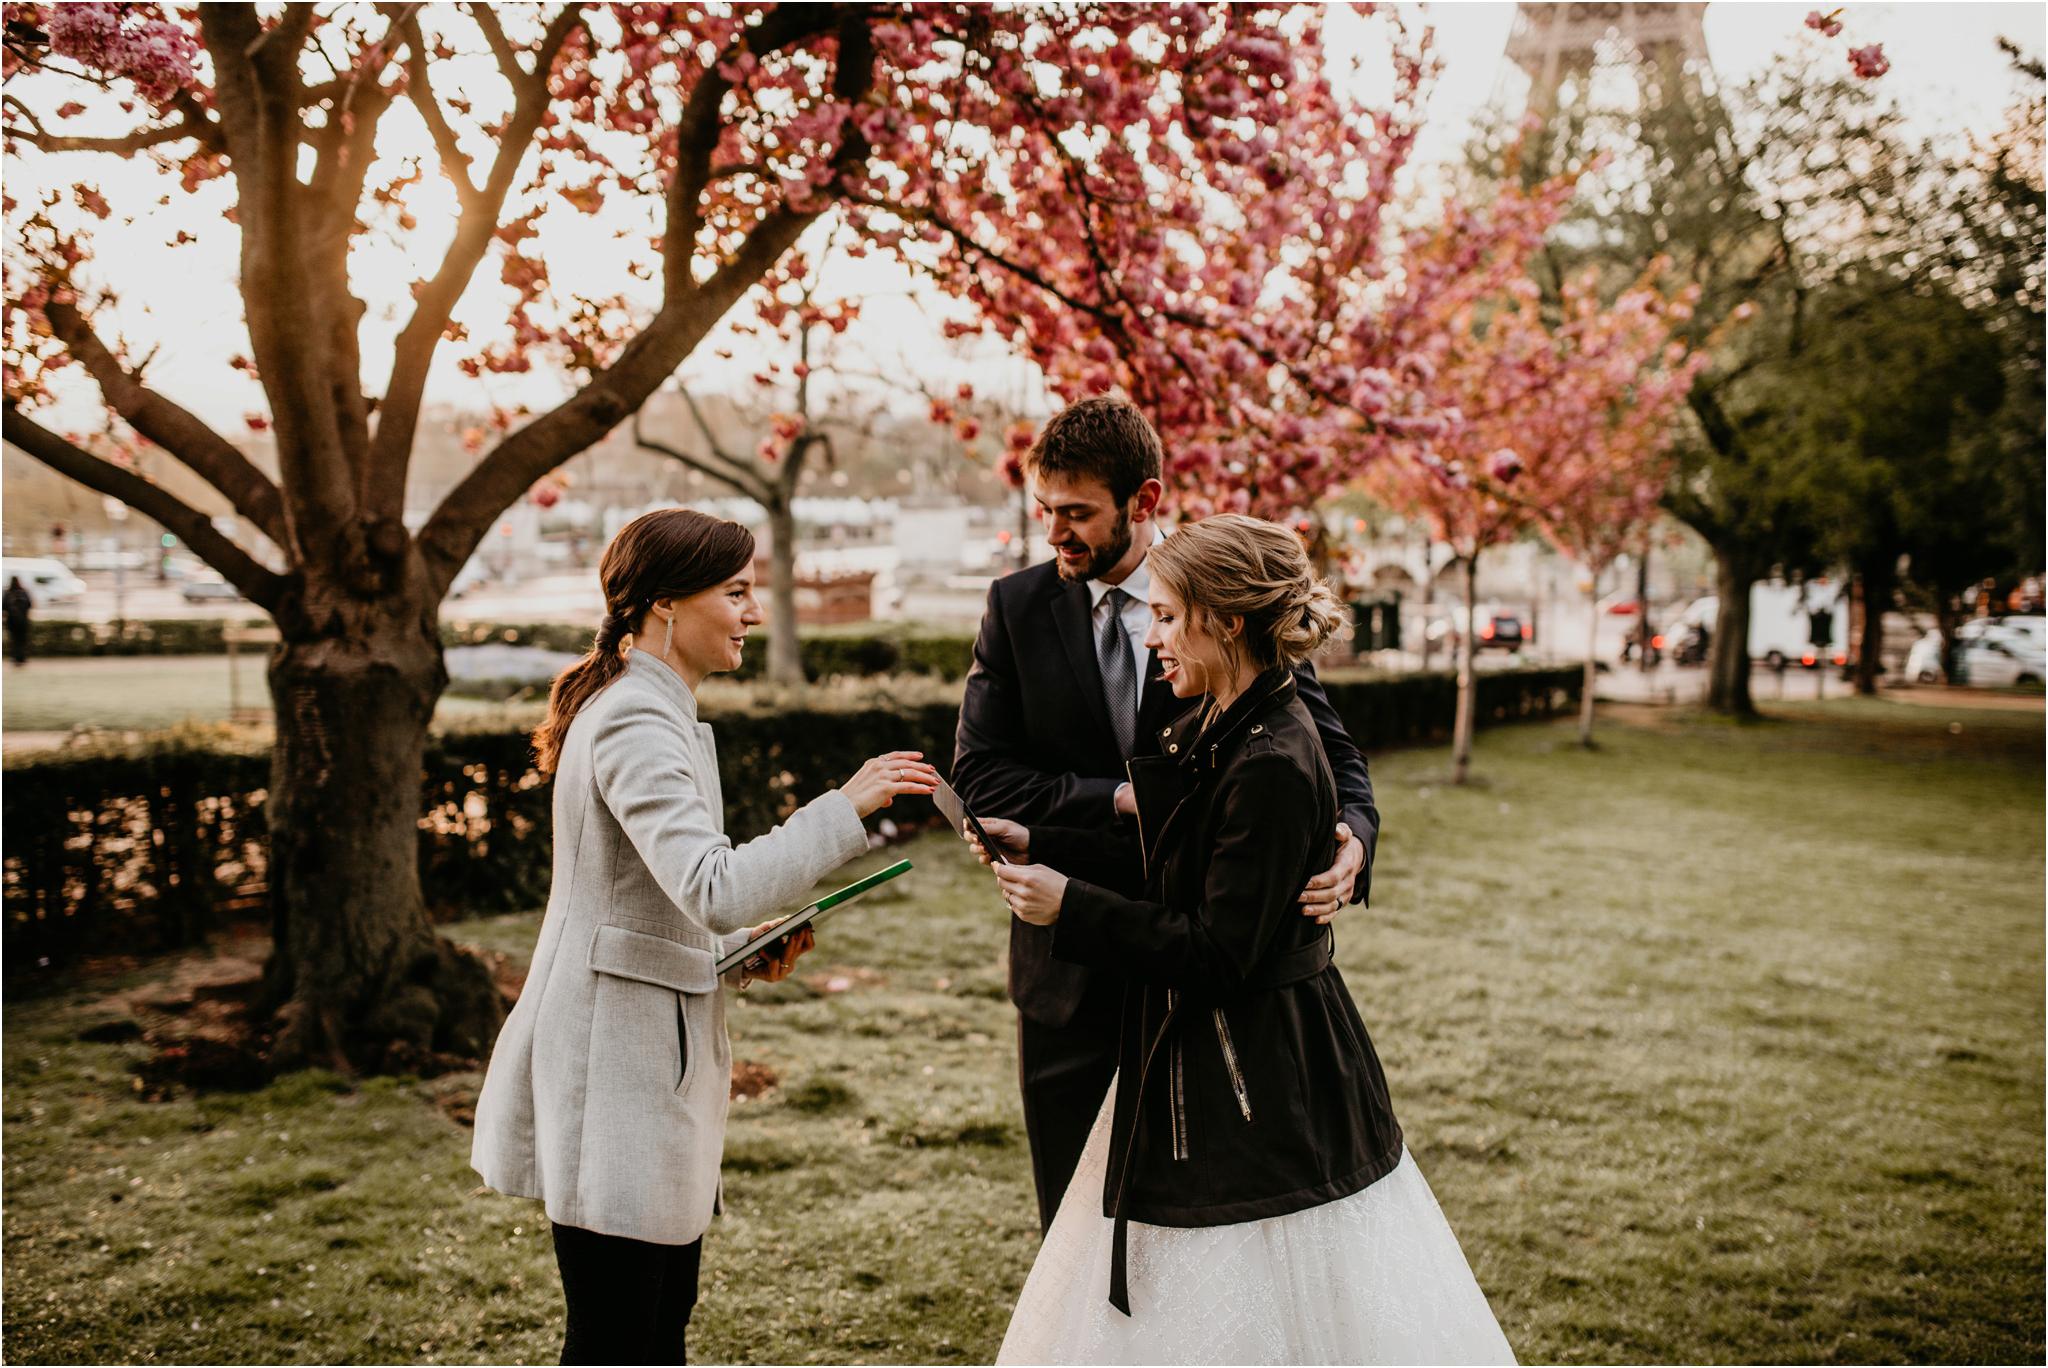 miranda-and-jared-paris-elopement-destination-wedding-photographer-043.jpg